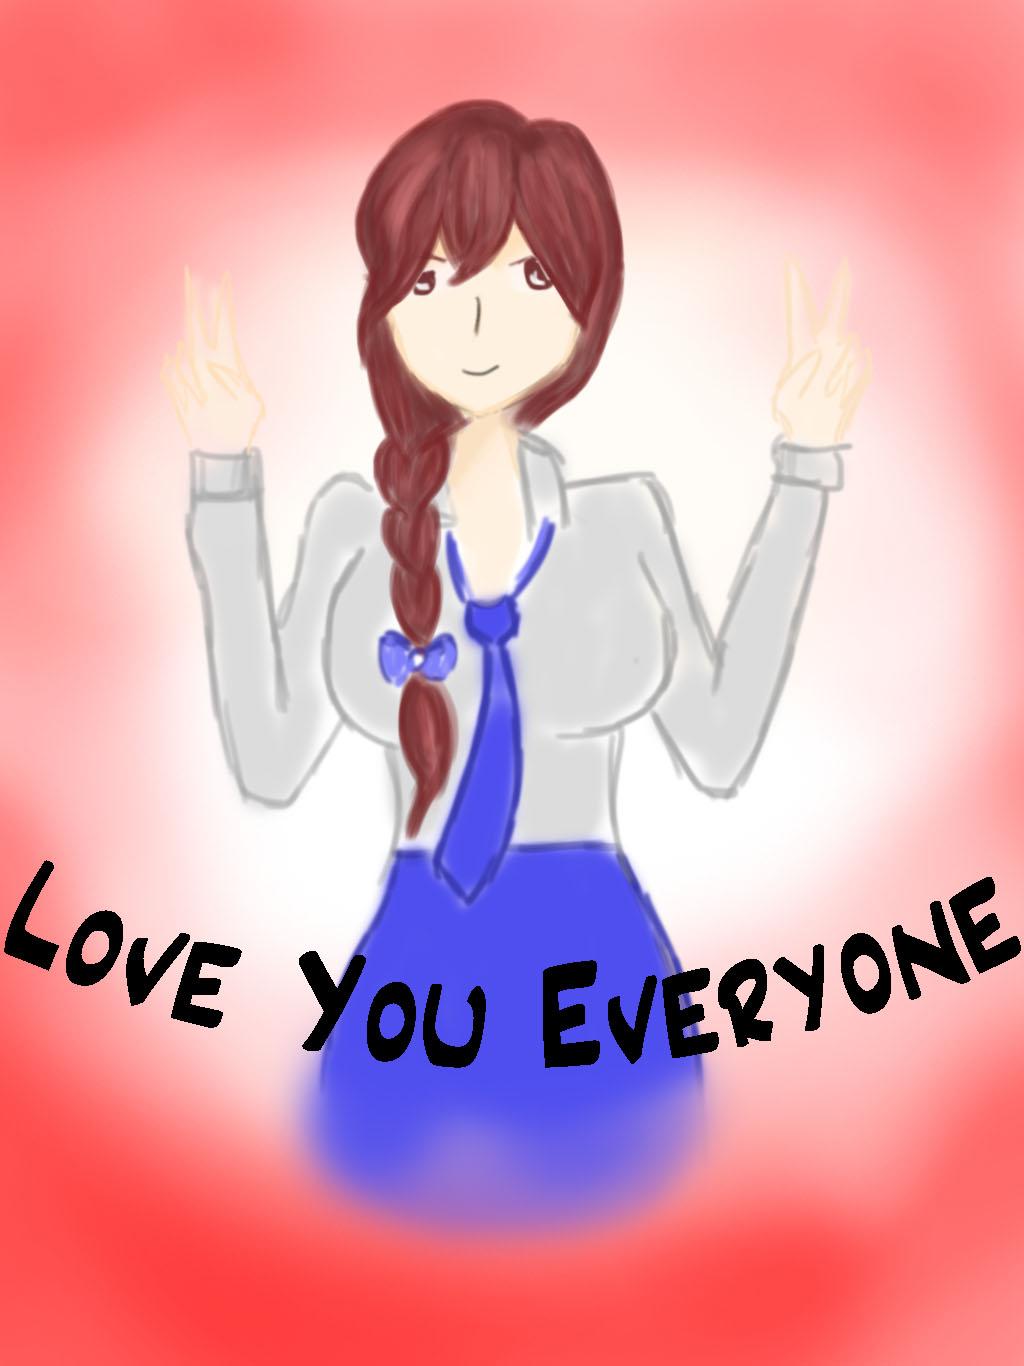 Love You E - ไม่จริงใช่ไหม